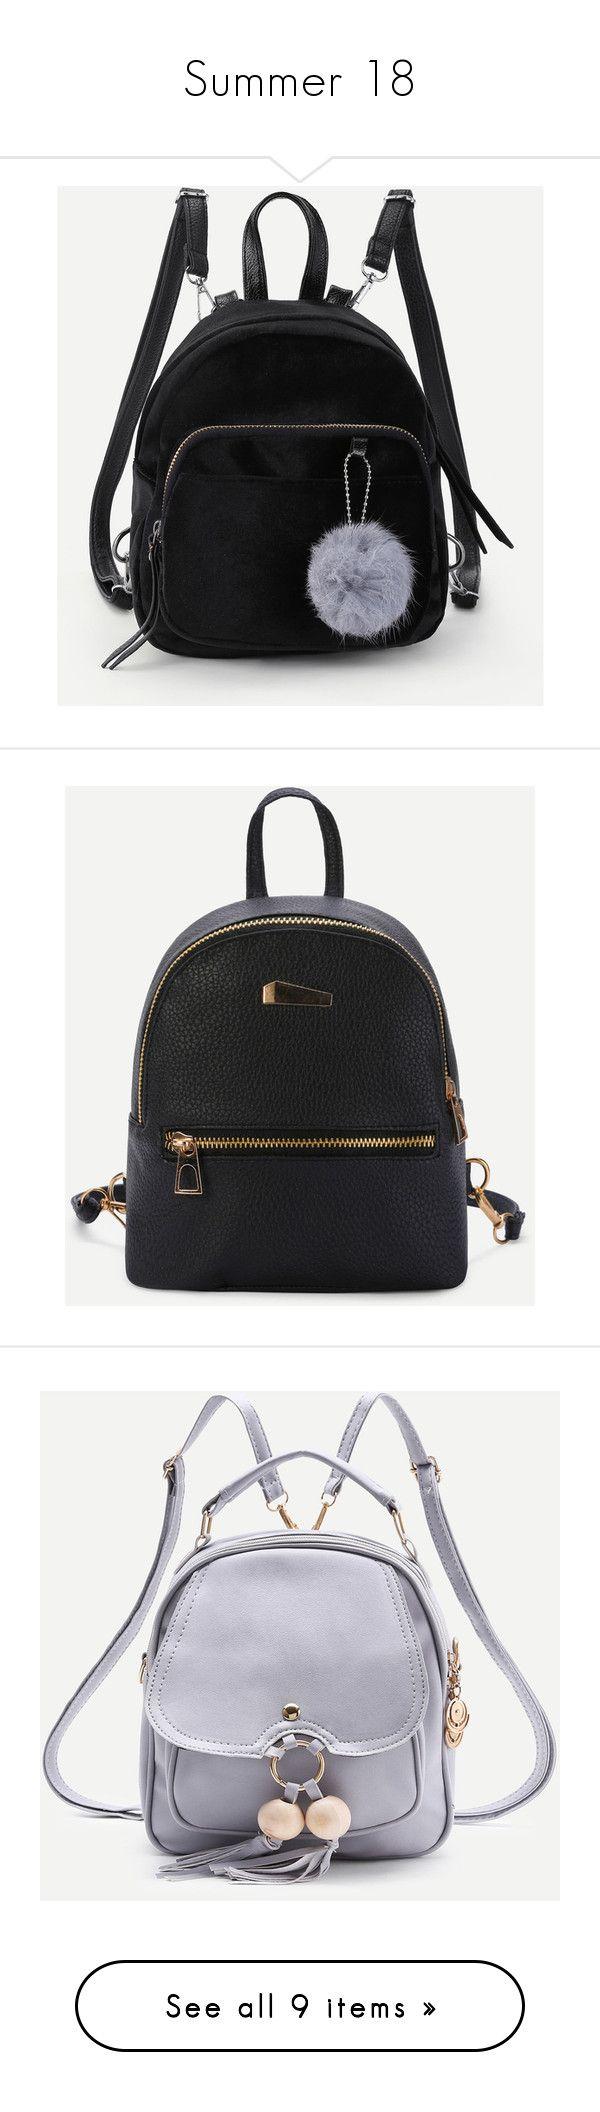 """Summer 18"" by raijienamoy ❤ liked on Polyvore featuring bags, backpacks, black, rucksack bags, decorating bags, backpack bags, velvet backpack, daypack bag, day pack backpack and knapsack bag"